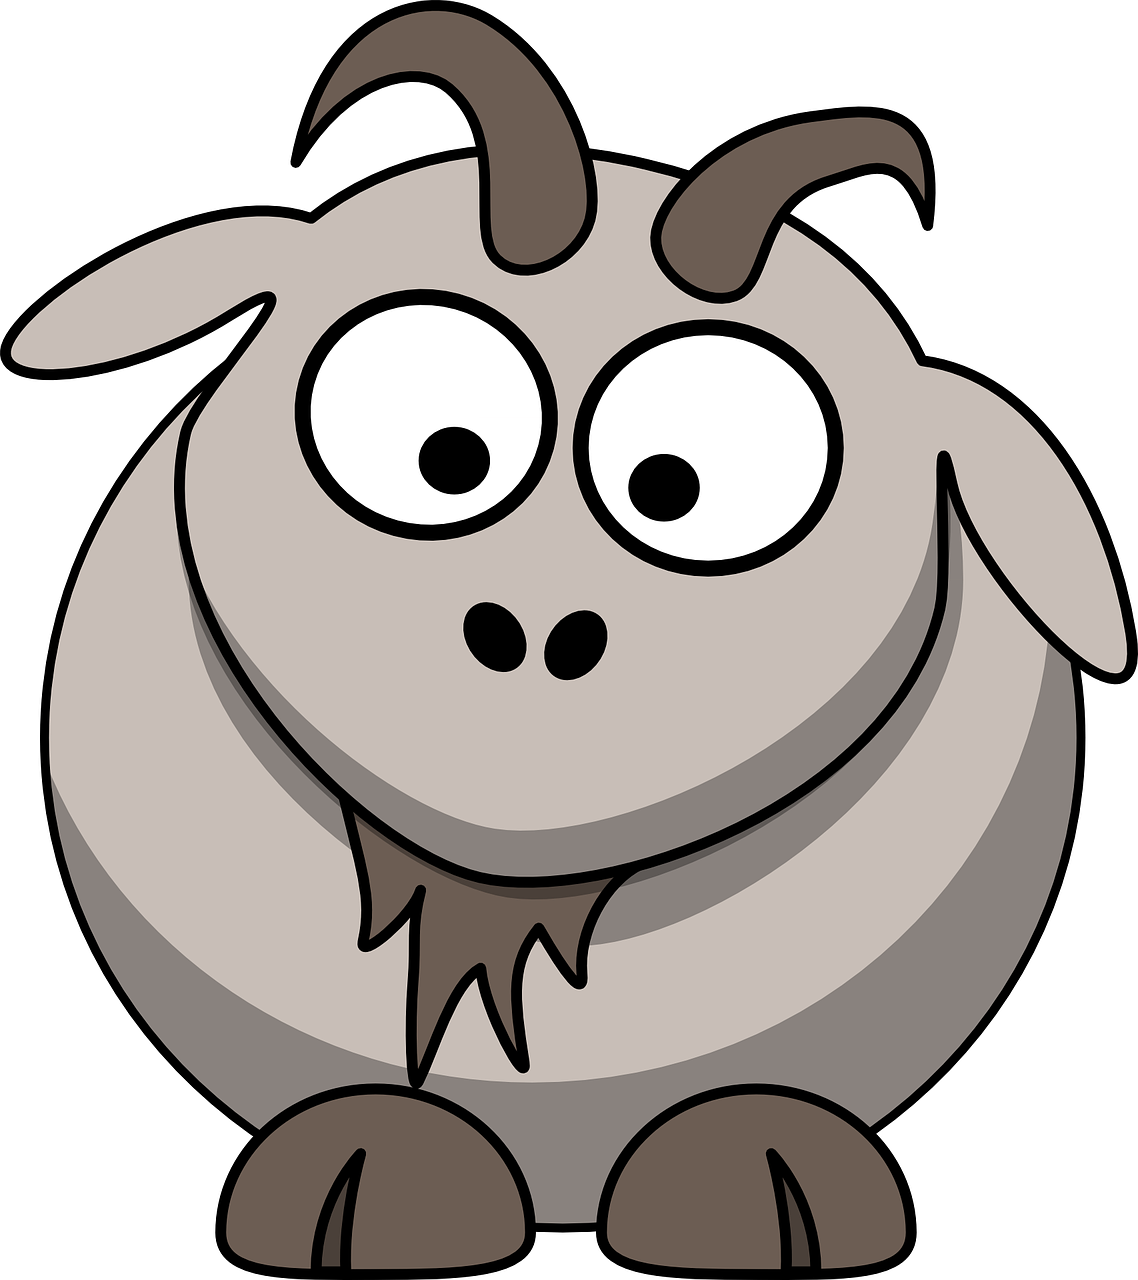 Goat Cartoon Cute Free Vector Graphic On Pixabay